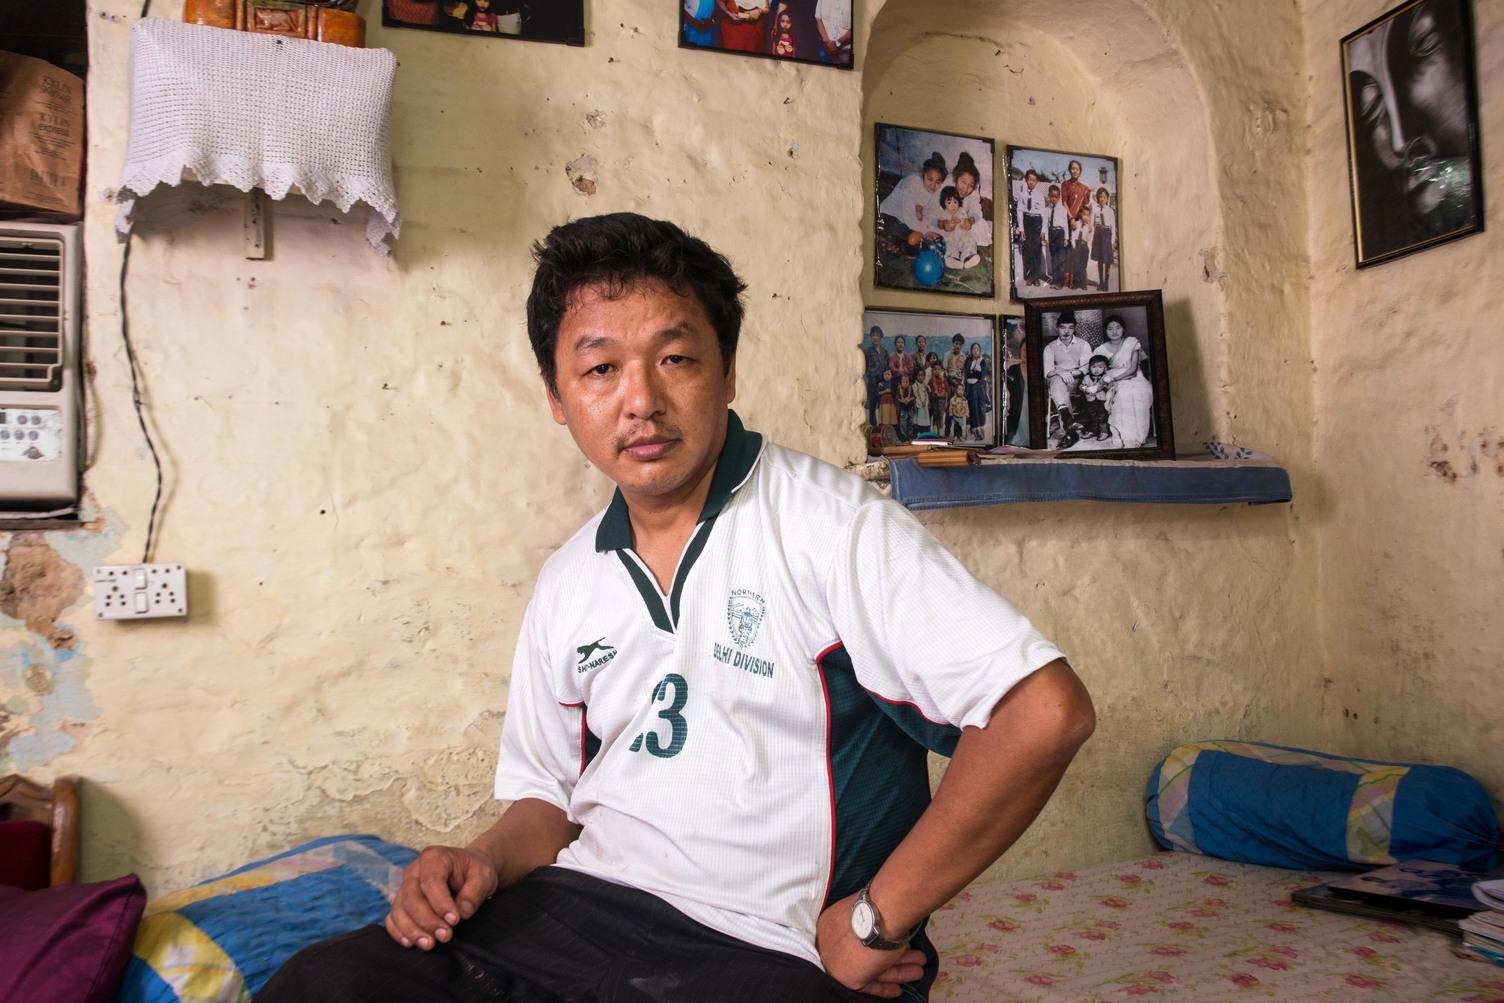 Guman Dhoj Limbu is a political activist from Darjeeling. He also owns a restaurant in Munirka, New Delhi